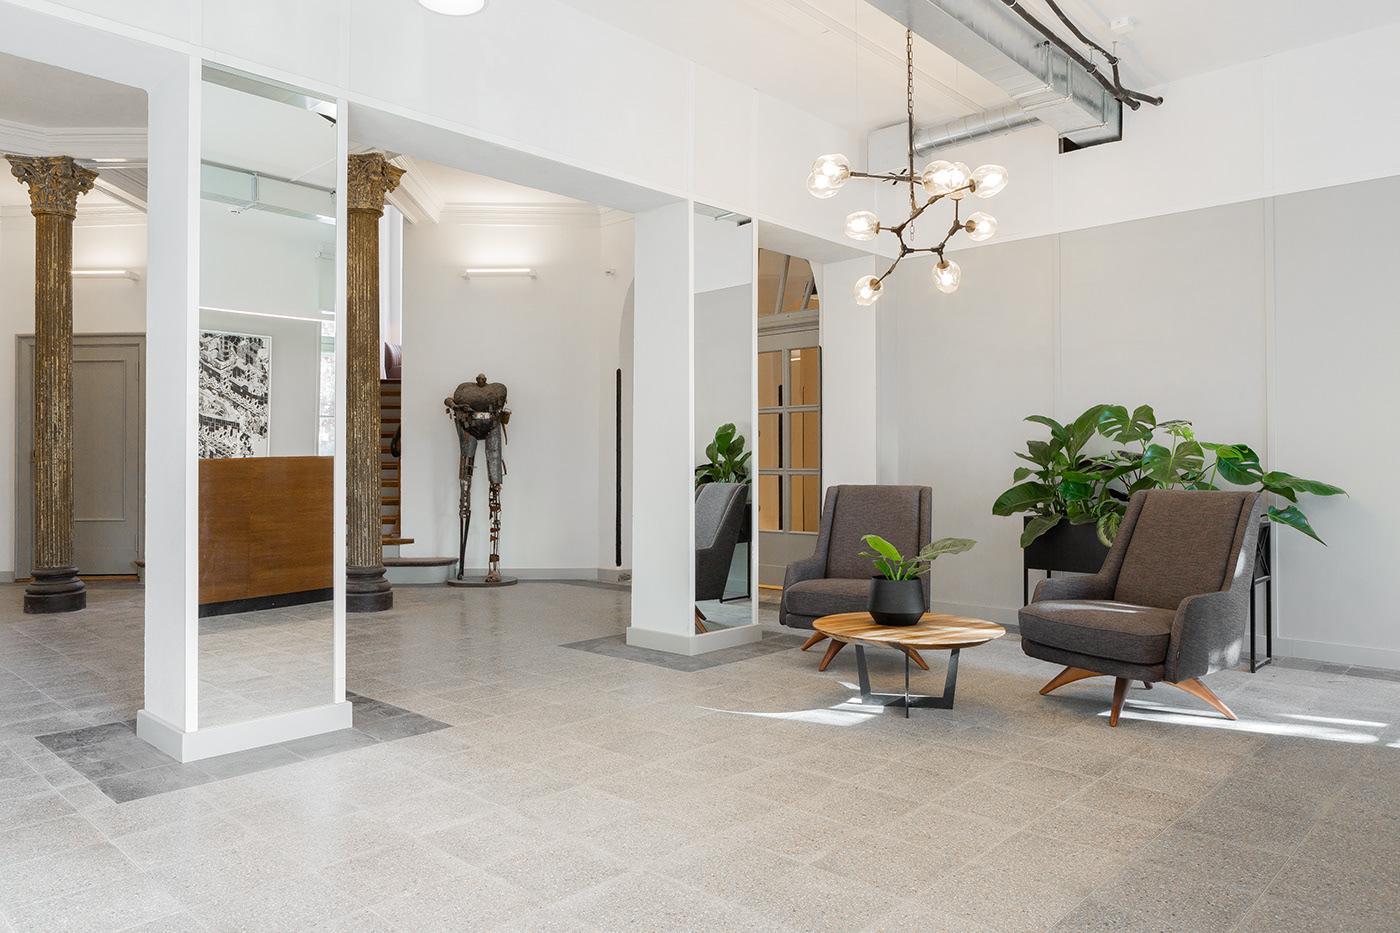 coworking design furtniture Gdansk Interior krusel Office stocznia